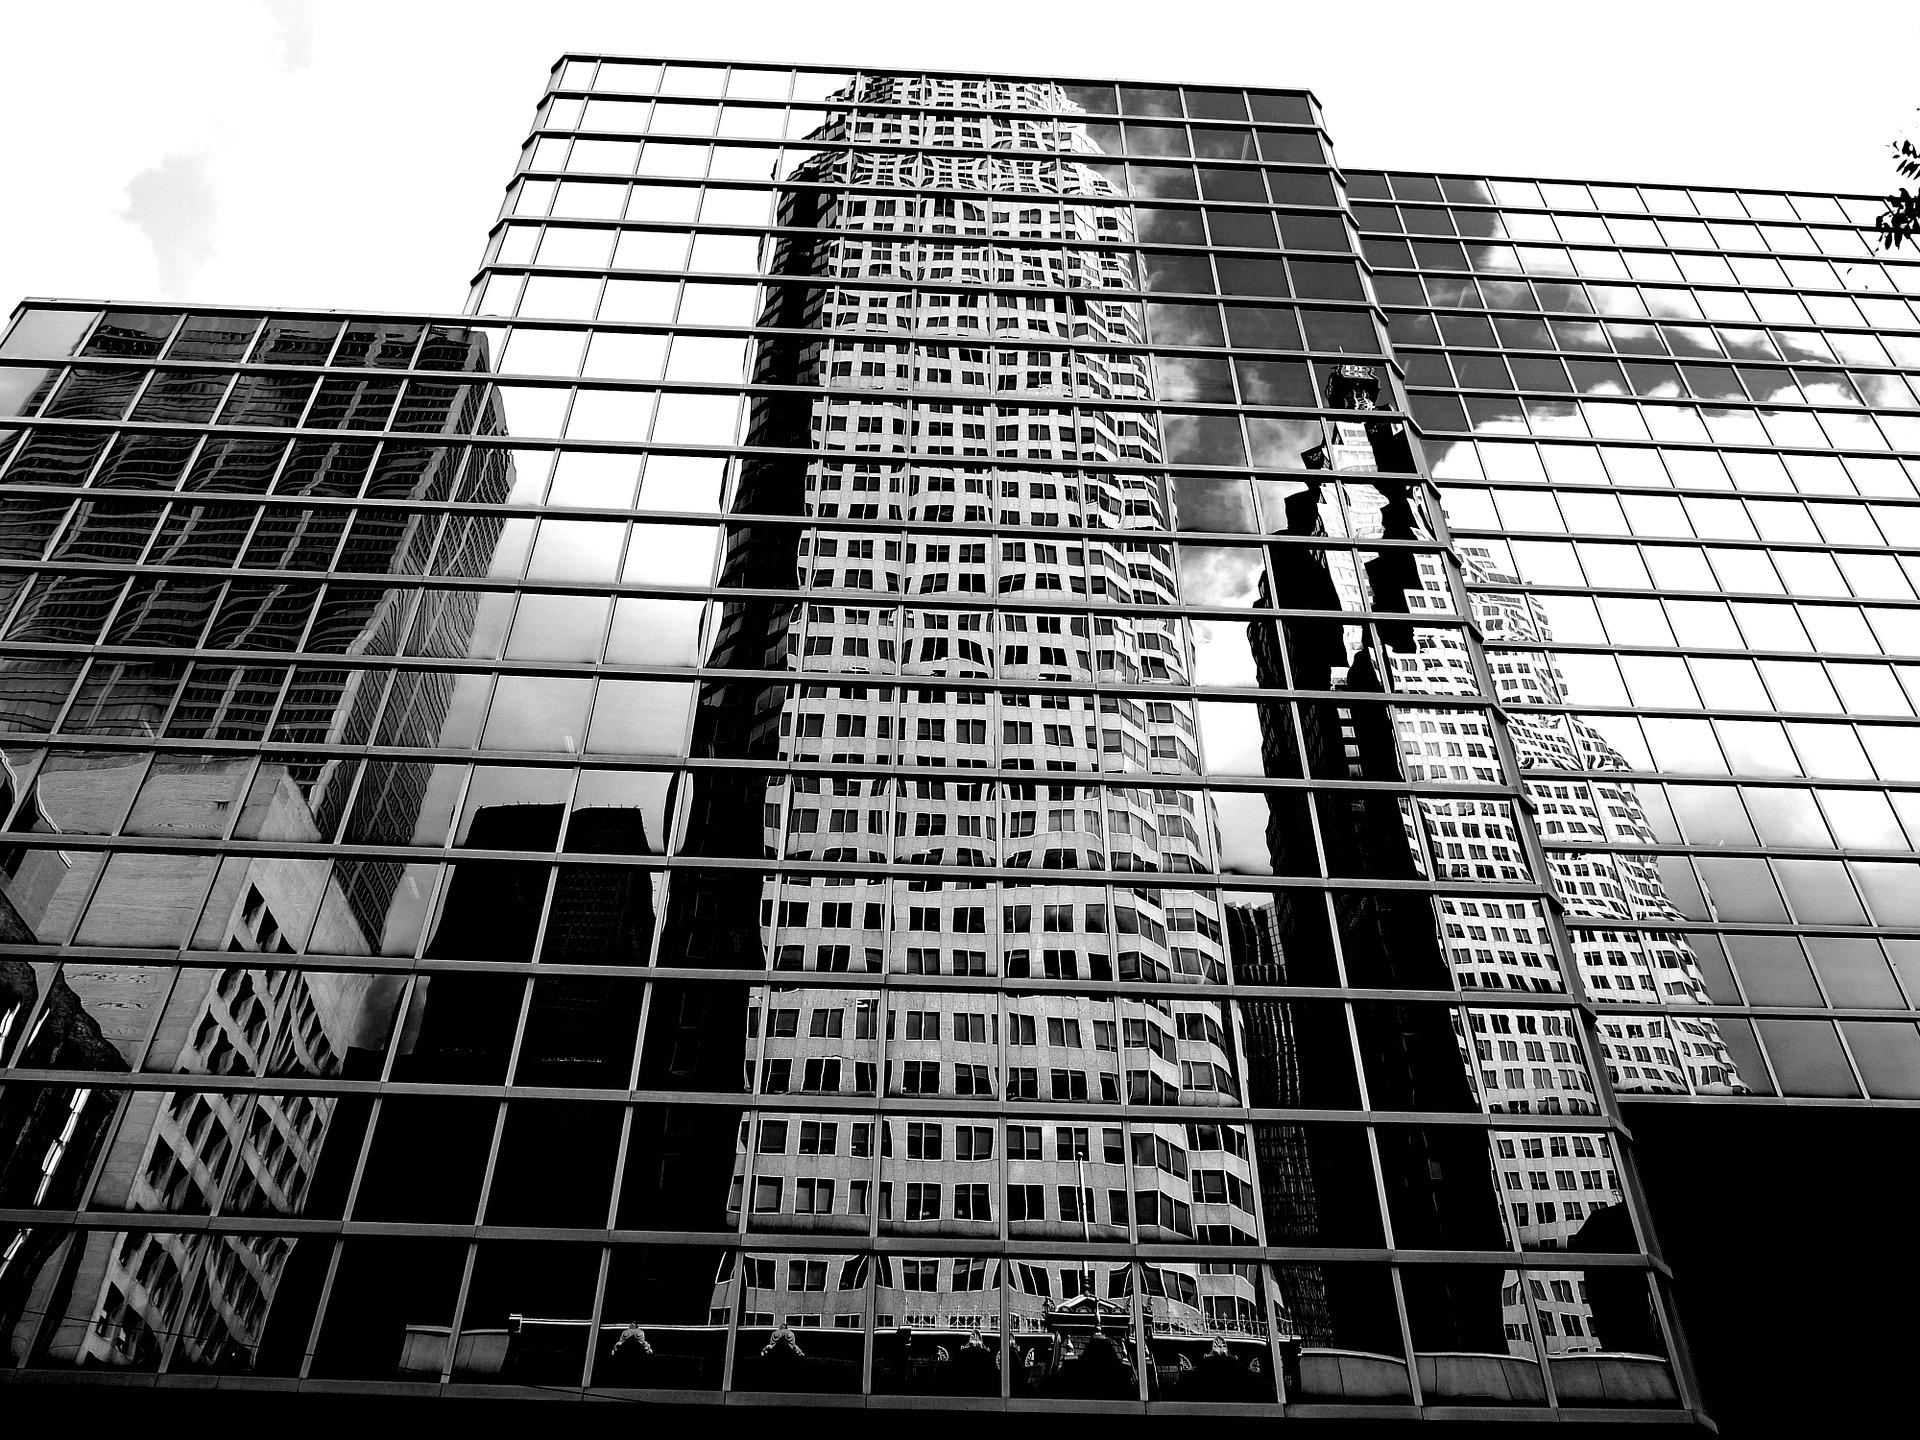 ETFs Are a Hit Among Financial Advisors